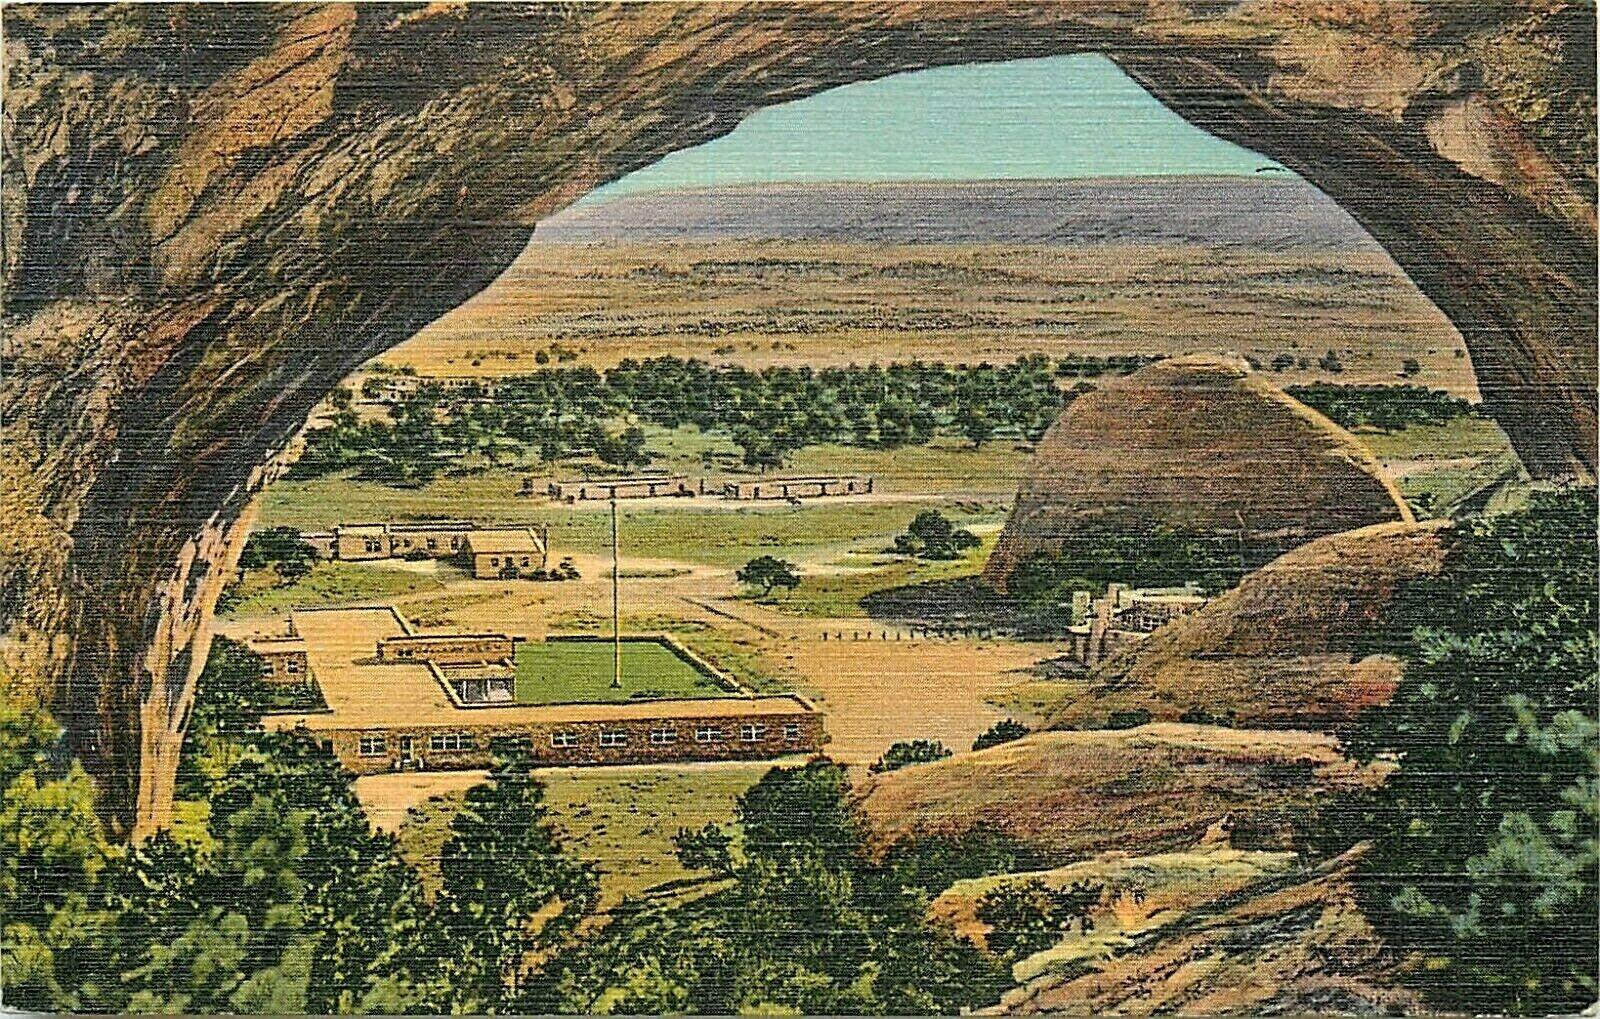 Central Navajo Indian Agency Window Rock, AZ